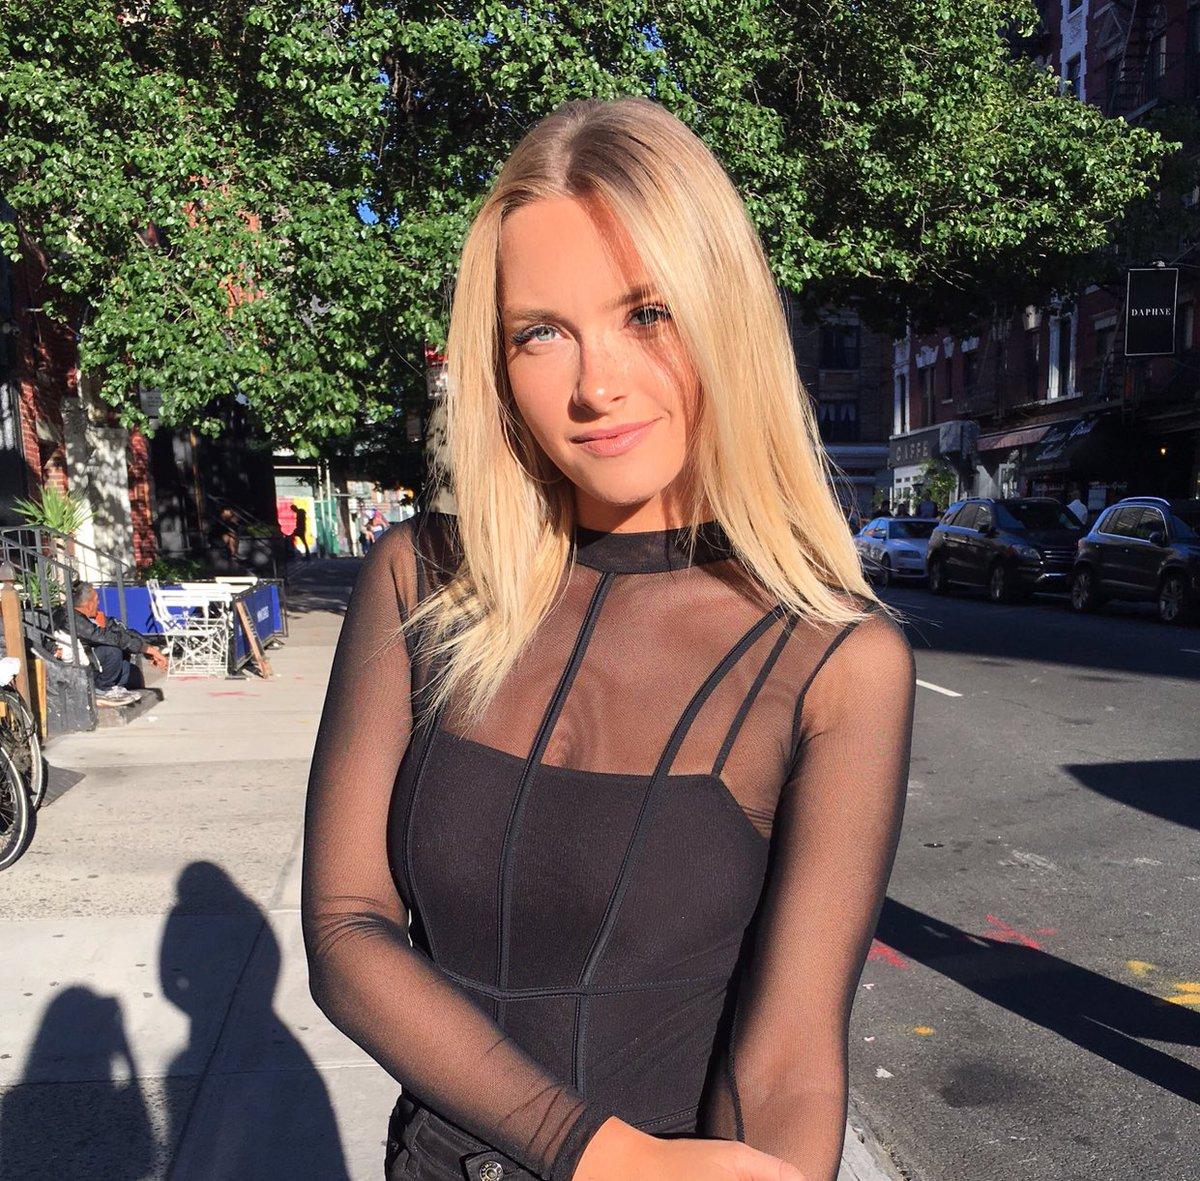 Camille Kostek S Sexy Instagram Photos On Zig: Camille Kostek Nude Photos 2019